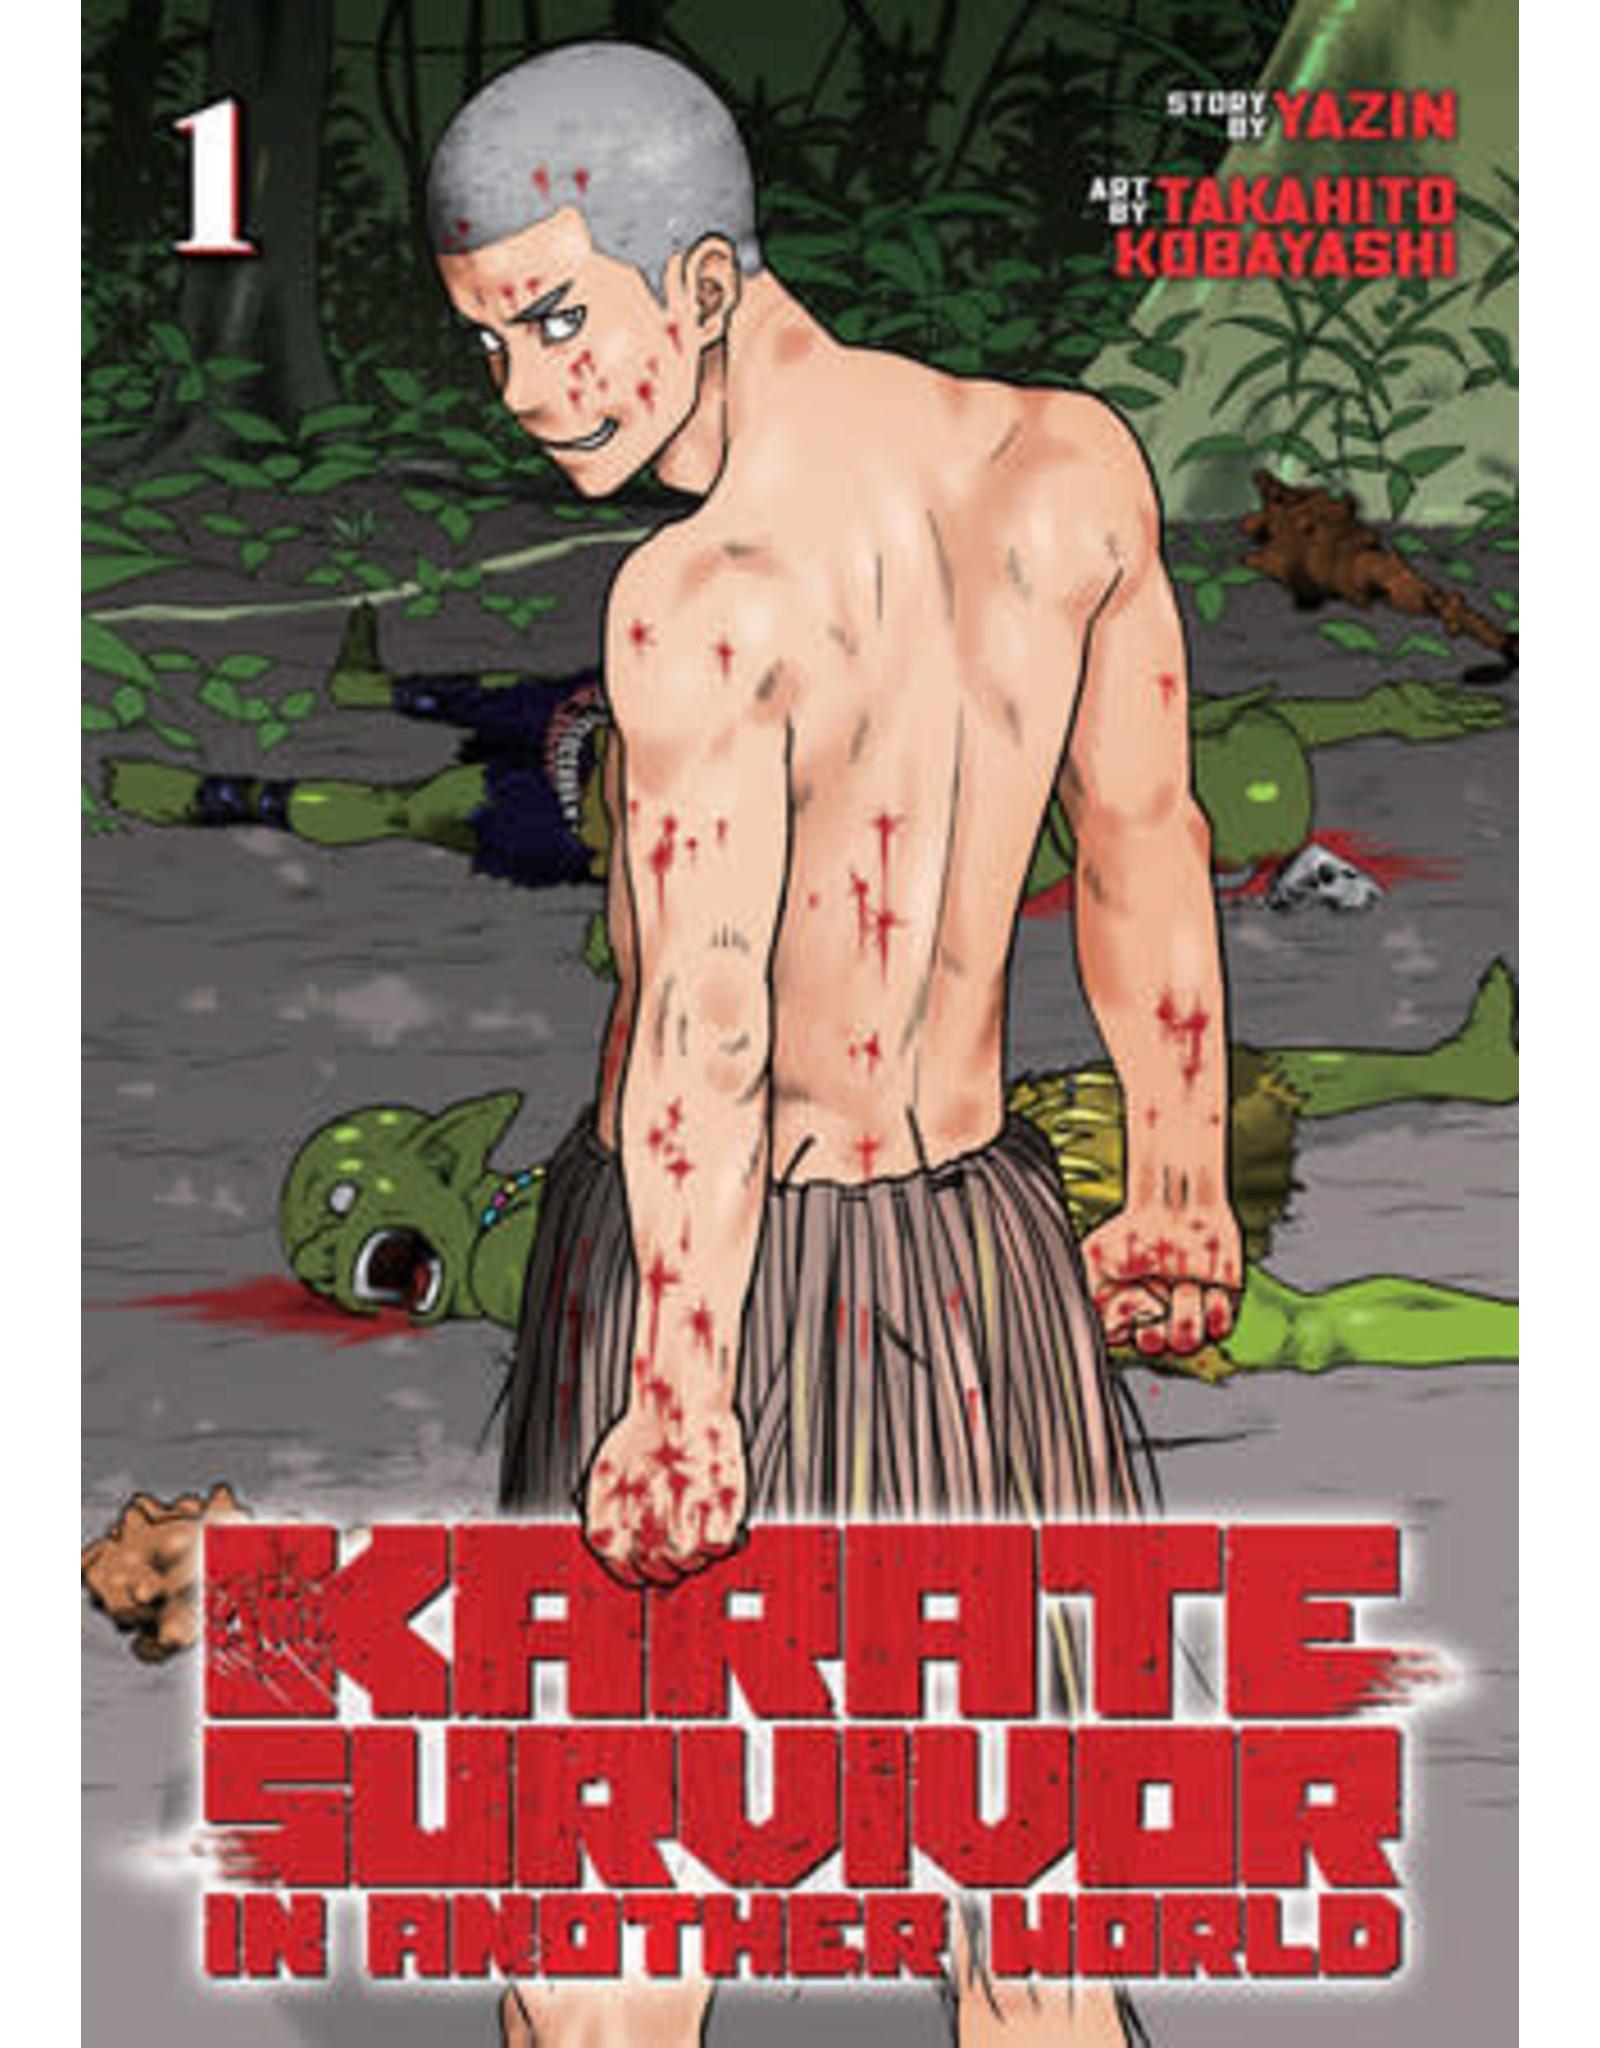 Karate Survivor in Another World 1 (Engelstalig) - Manga